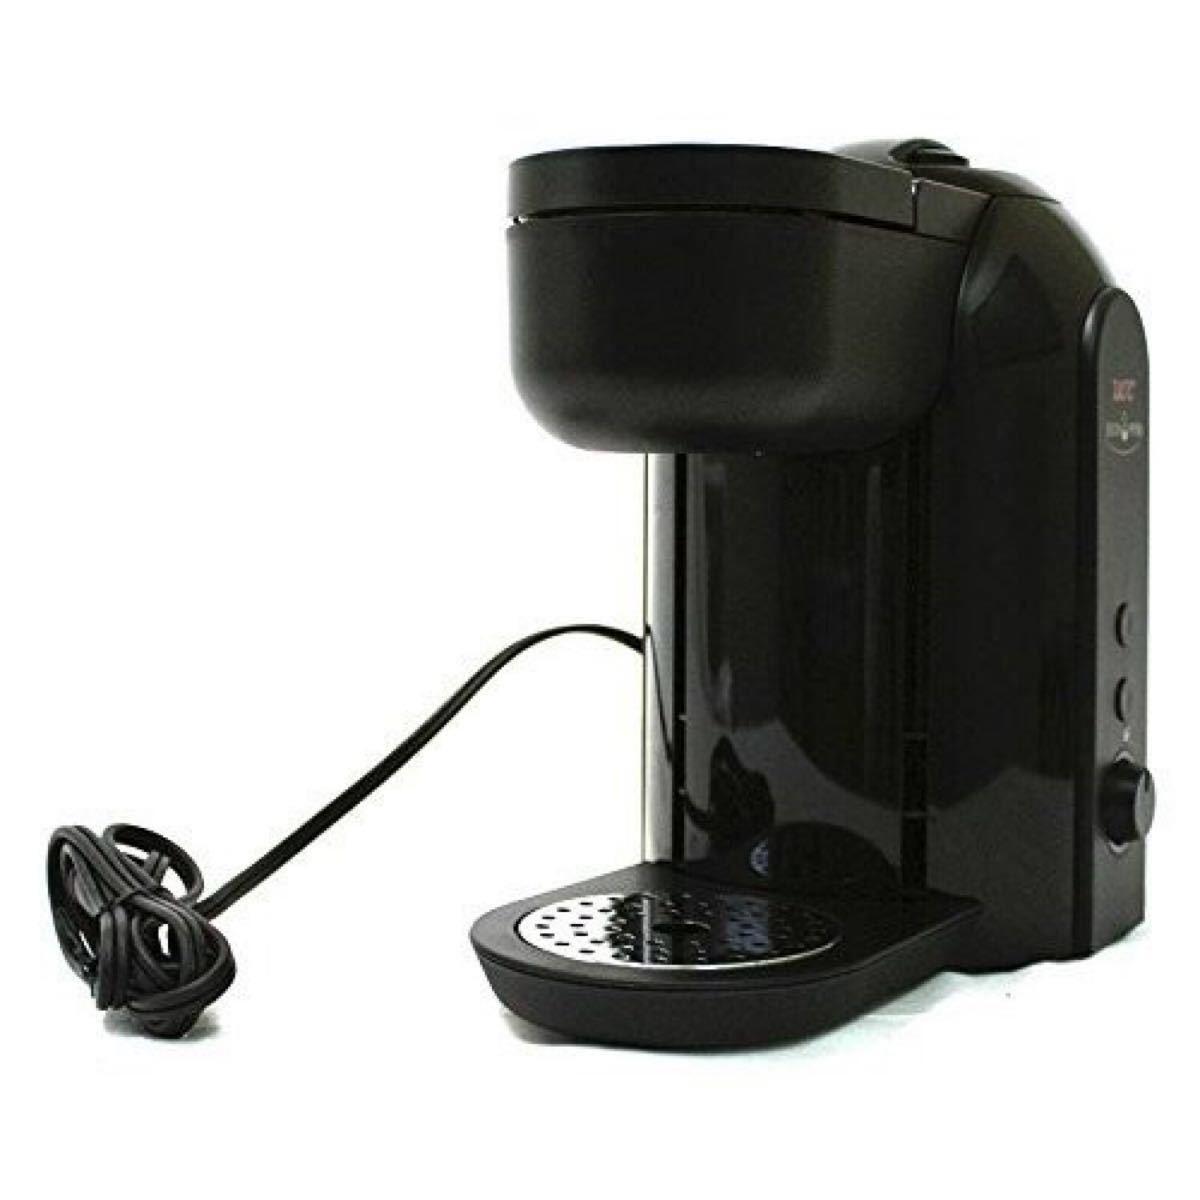 UCC Pelica コーヒーメーカー(中古 美品)